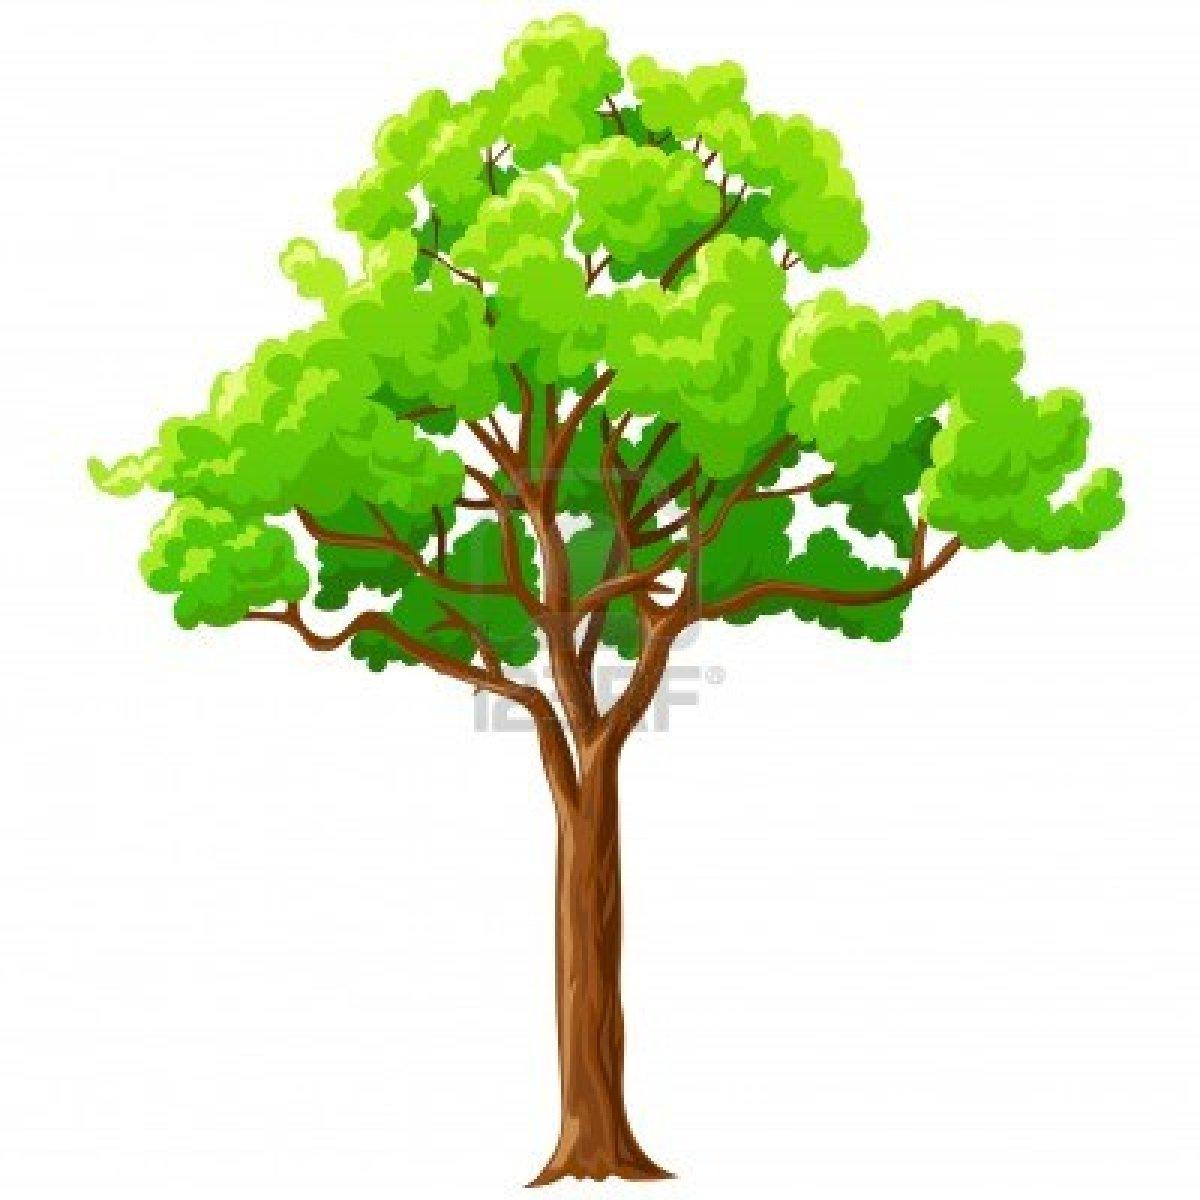 Tree Cartoon - ClipArt Best